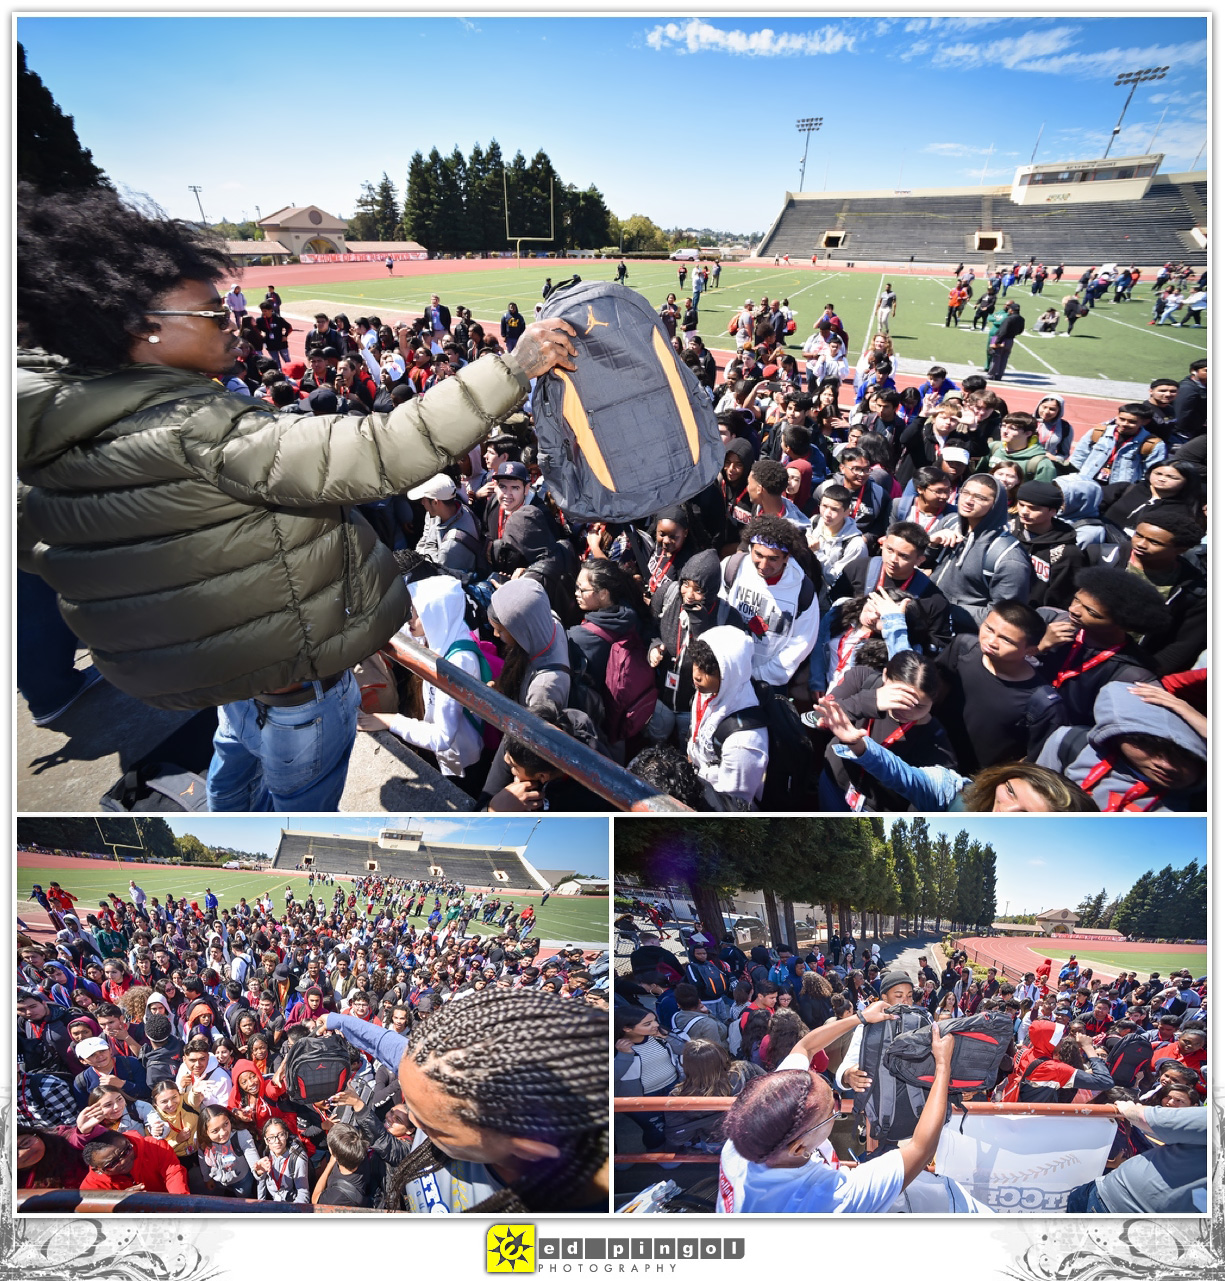 2018.09.06 - PitCCh In at Vallejo High School 011.JPG